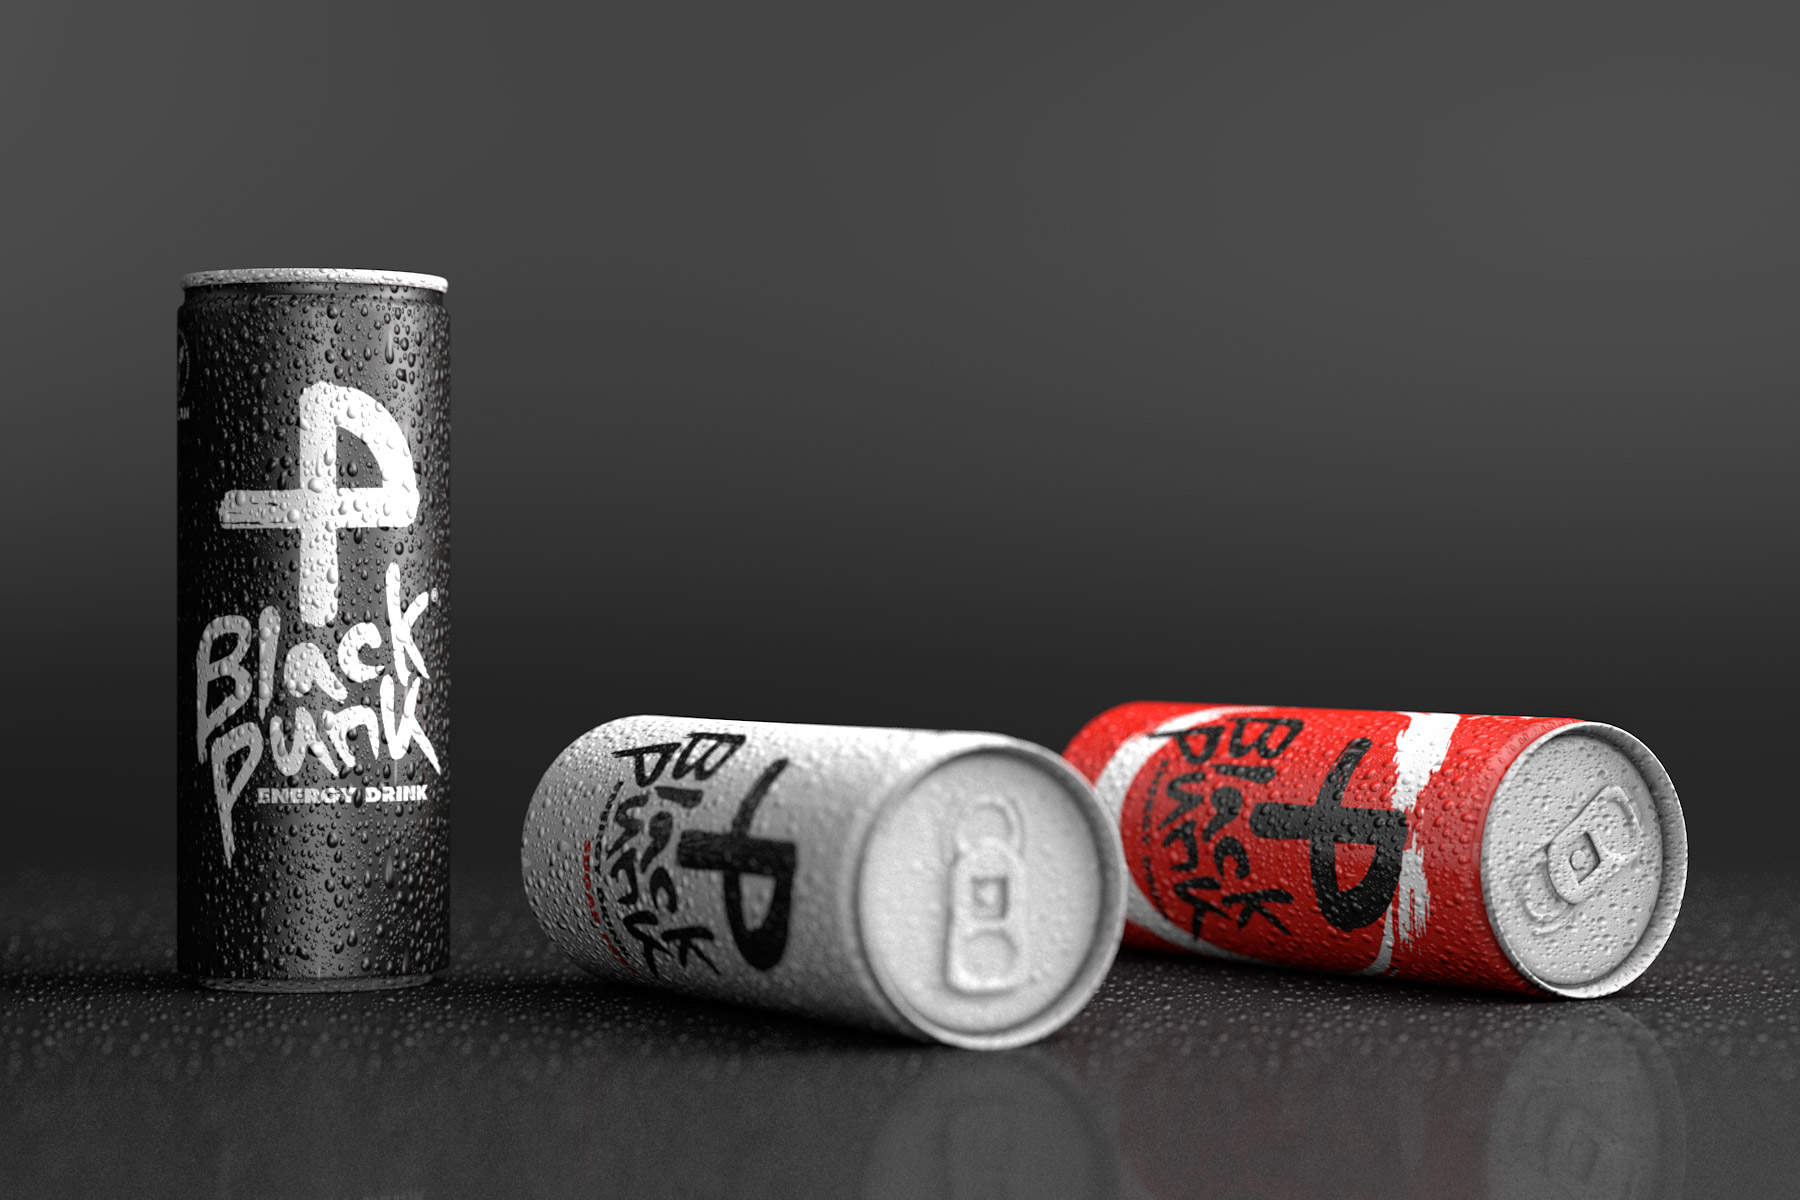 Black Punk Energy Drink